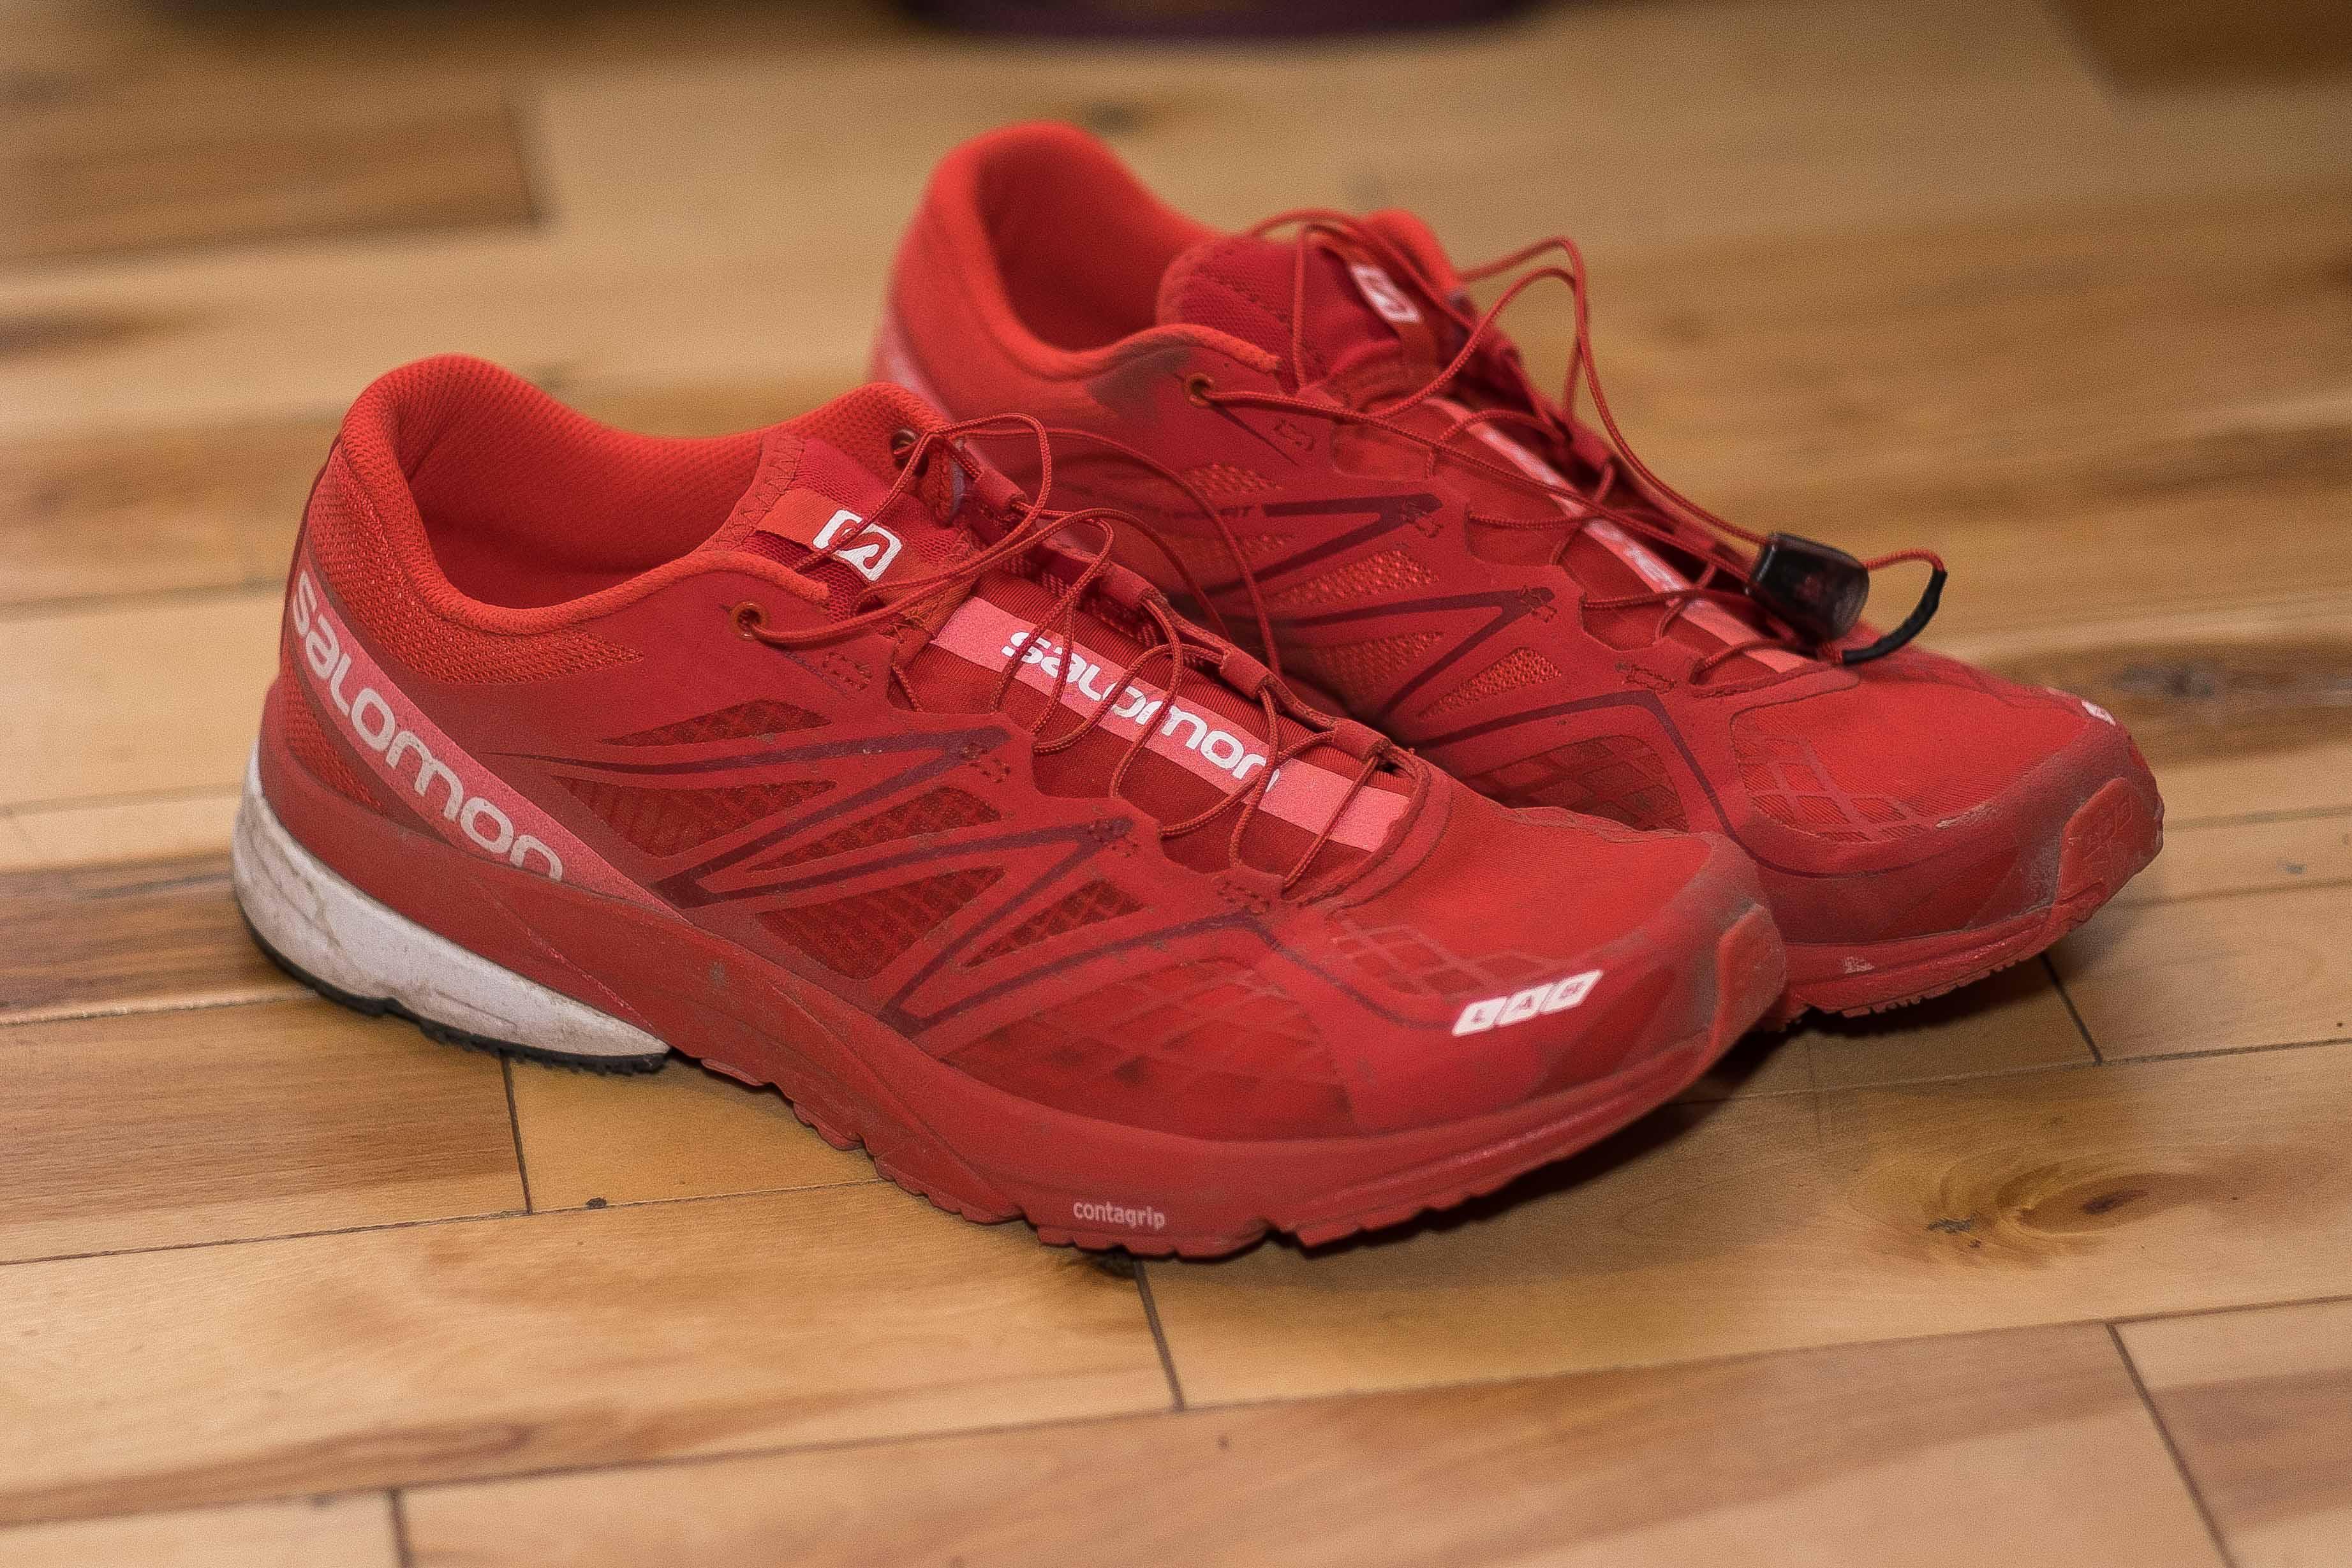 Tested – Salomon S-LAB X-SERIES shoe